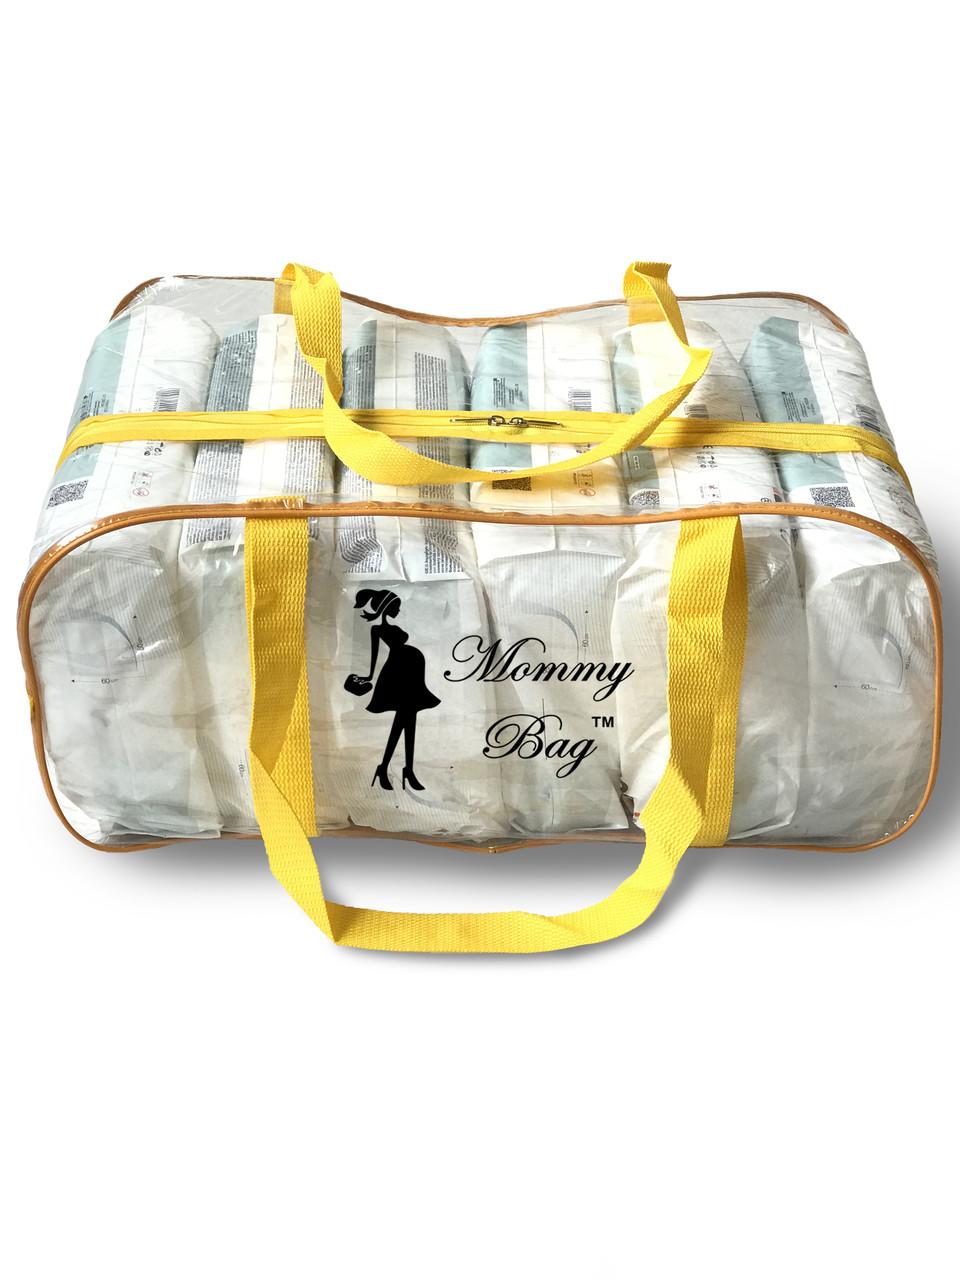 Сумка прозрачная в роддом Mommy Bag - L - 50*23*32 см Желтая